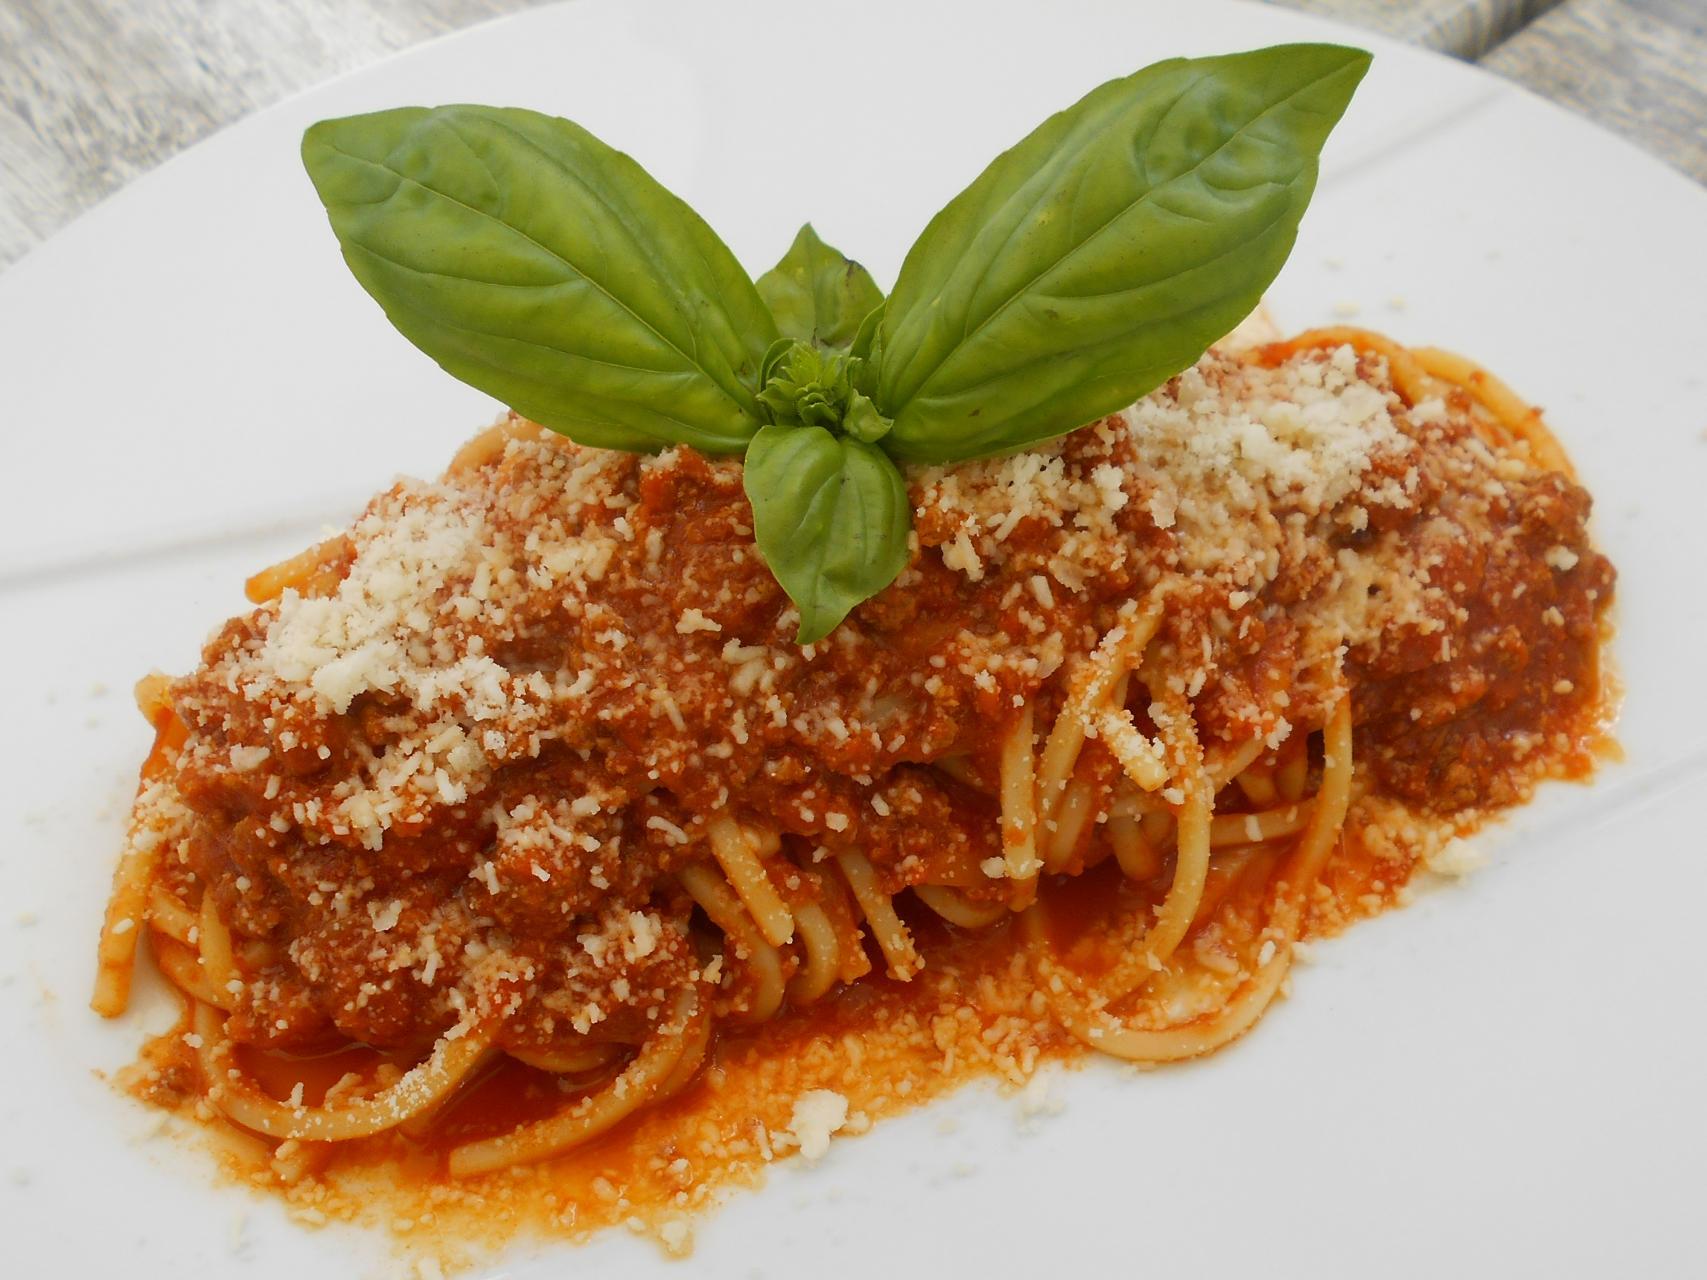 The half portion of spaghetti.